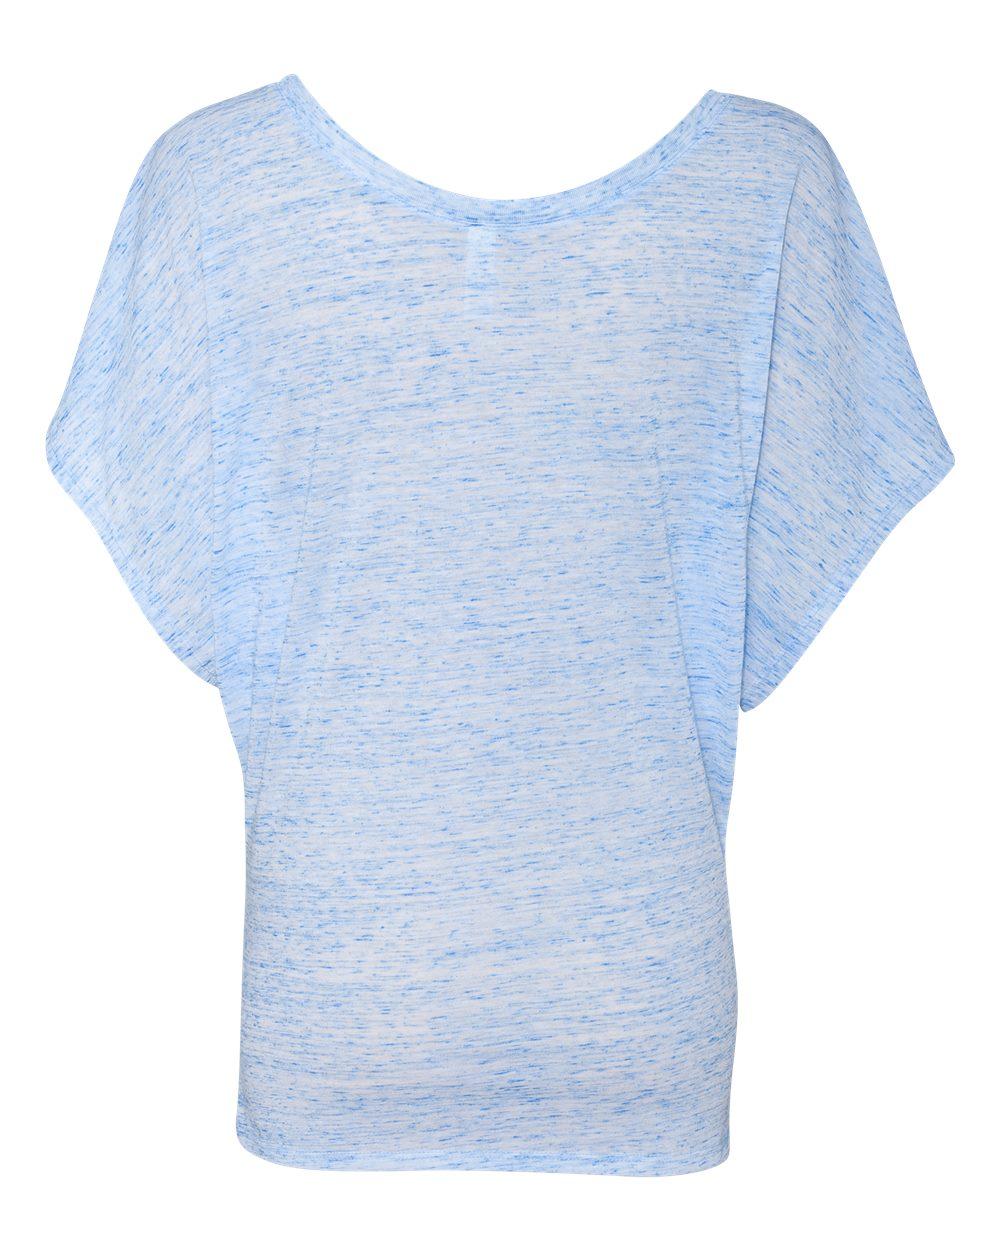 Bella-Canvas-Women-039-s-Flowy-Draped-Sleeve-Dolman-T-Shirt-8821-S-2XL thumbnail 19